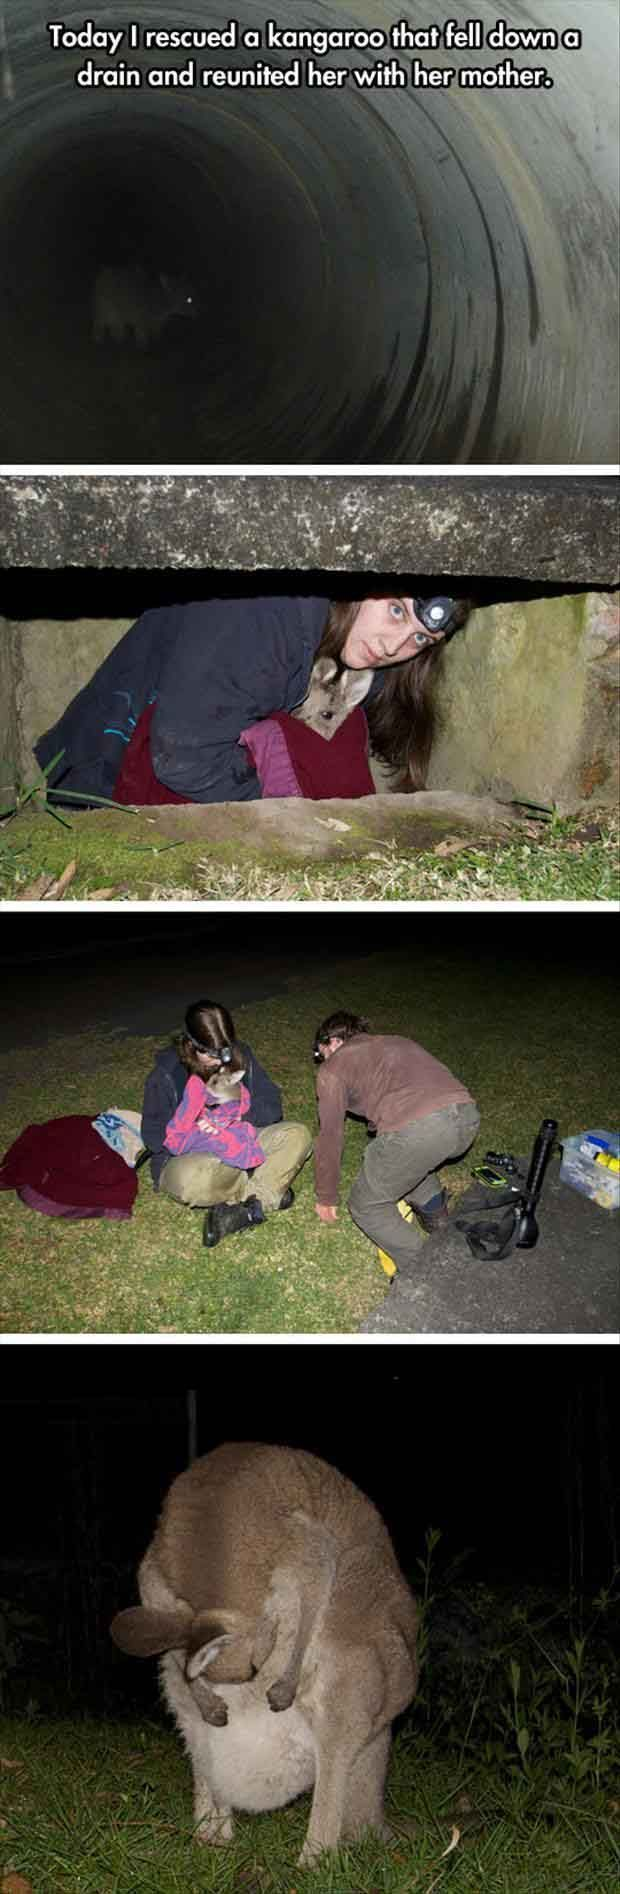 Kangaroo Rescue